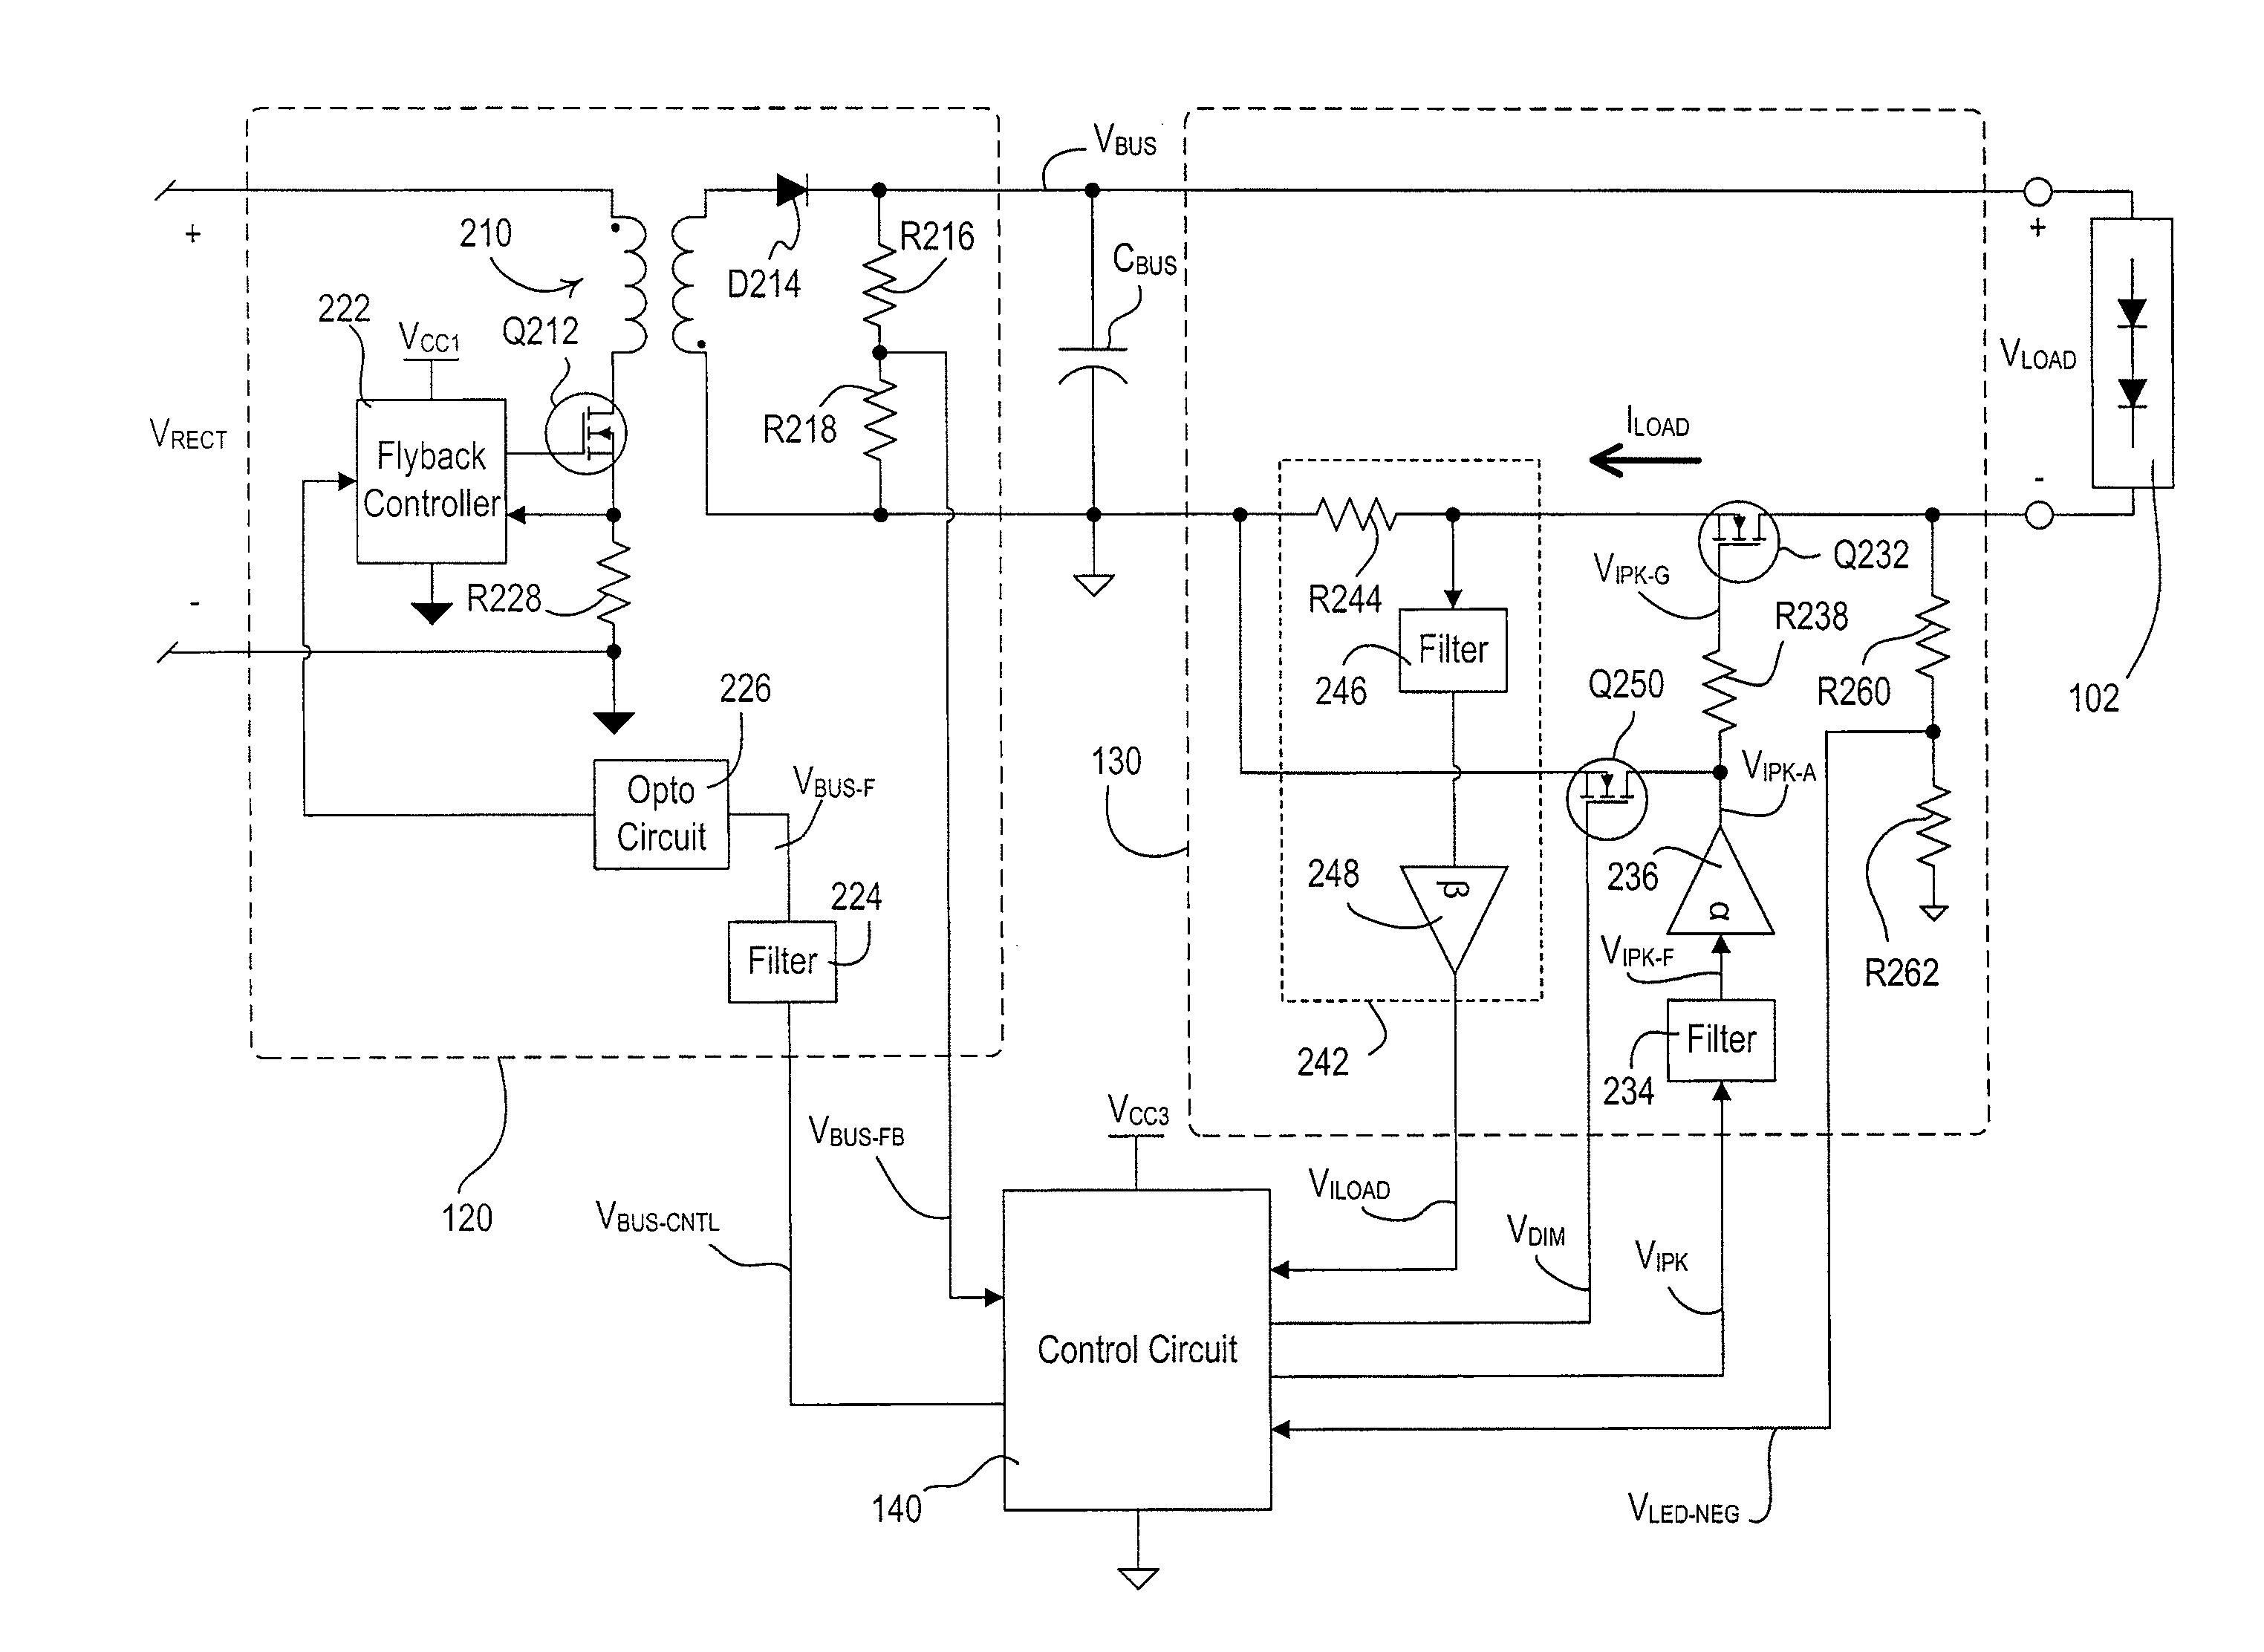 Patent Us 9035563 B2 Ingersoll Case 222 Wiring Diagram First Claim